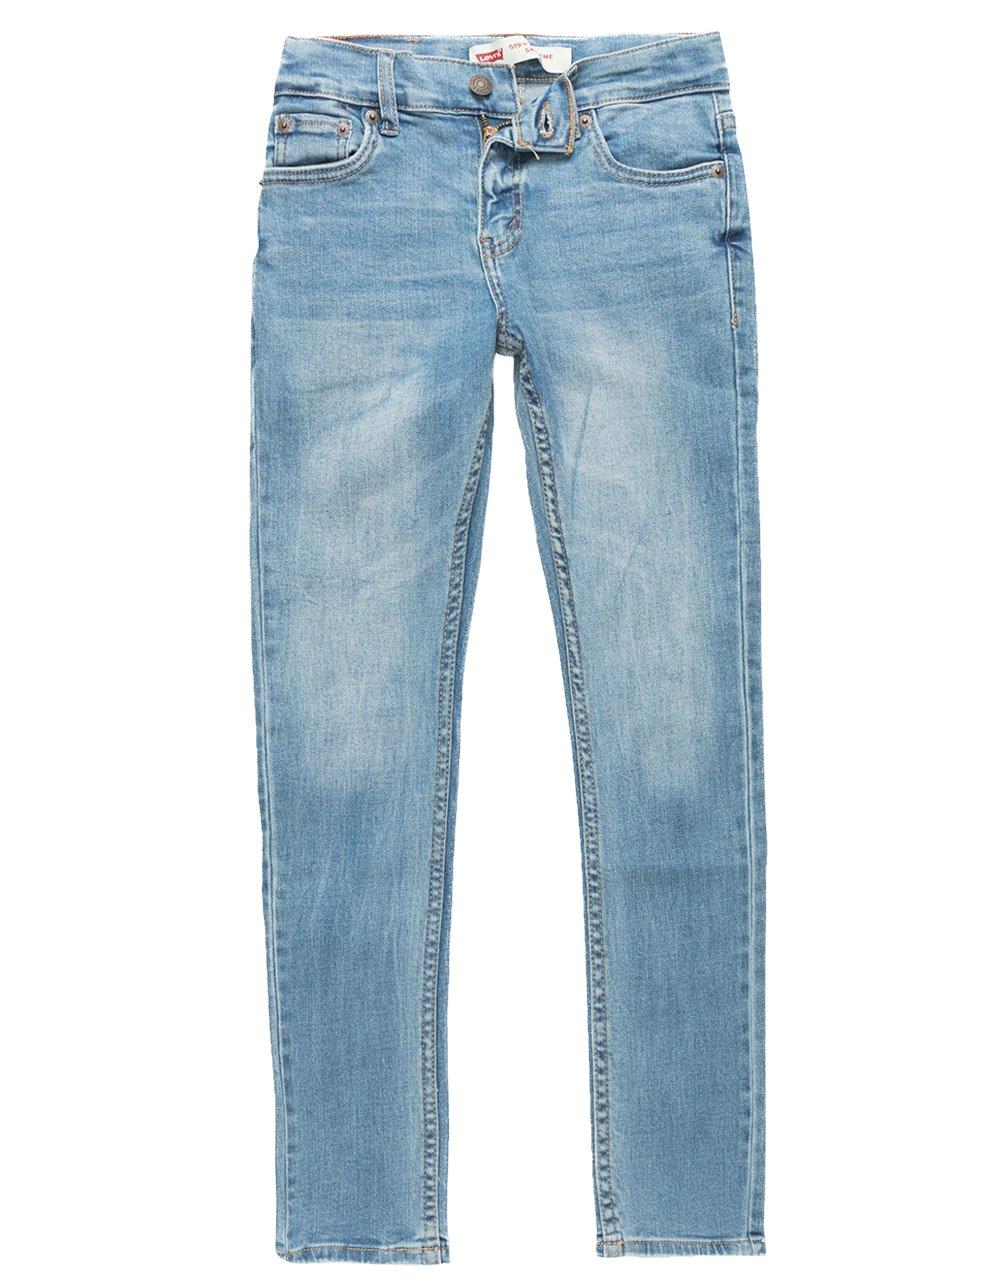 Levi's Big Boys' 519 Extreme Skinny Fit Jeans, Palisades, 16